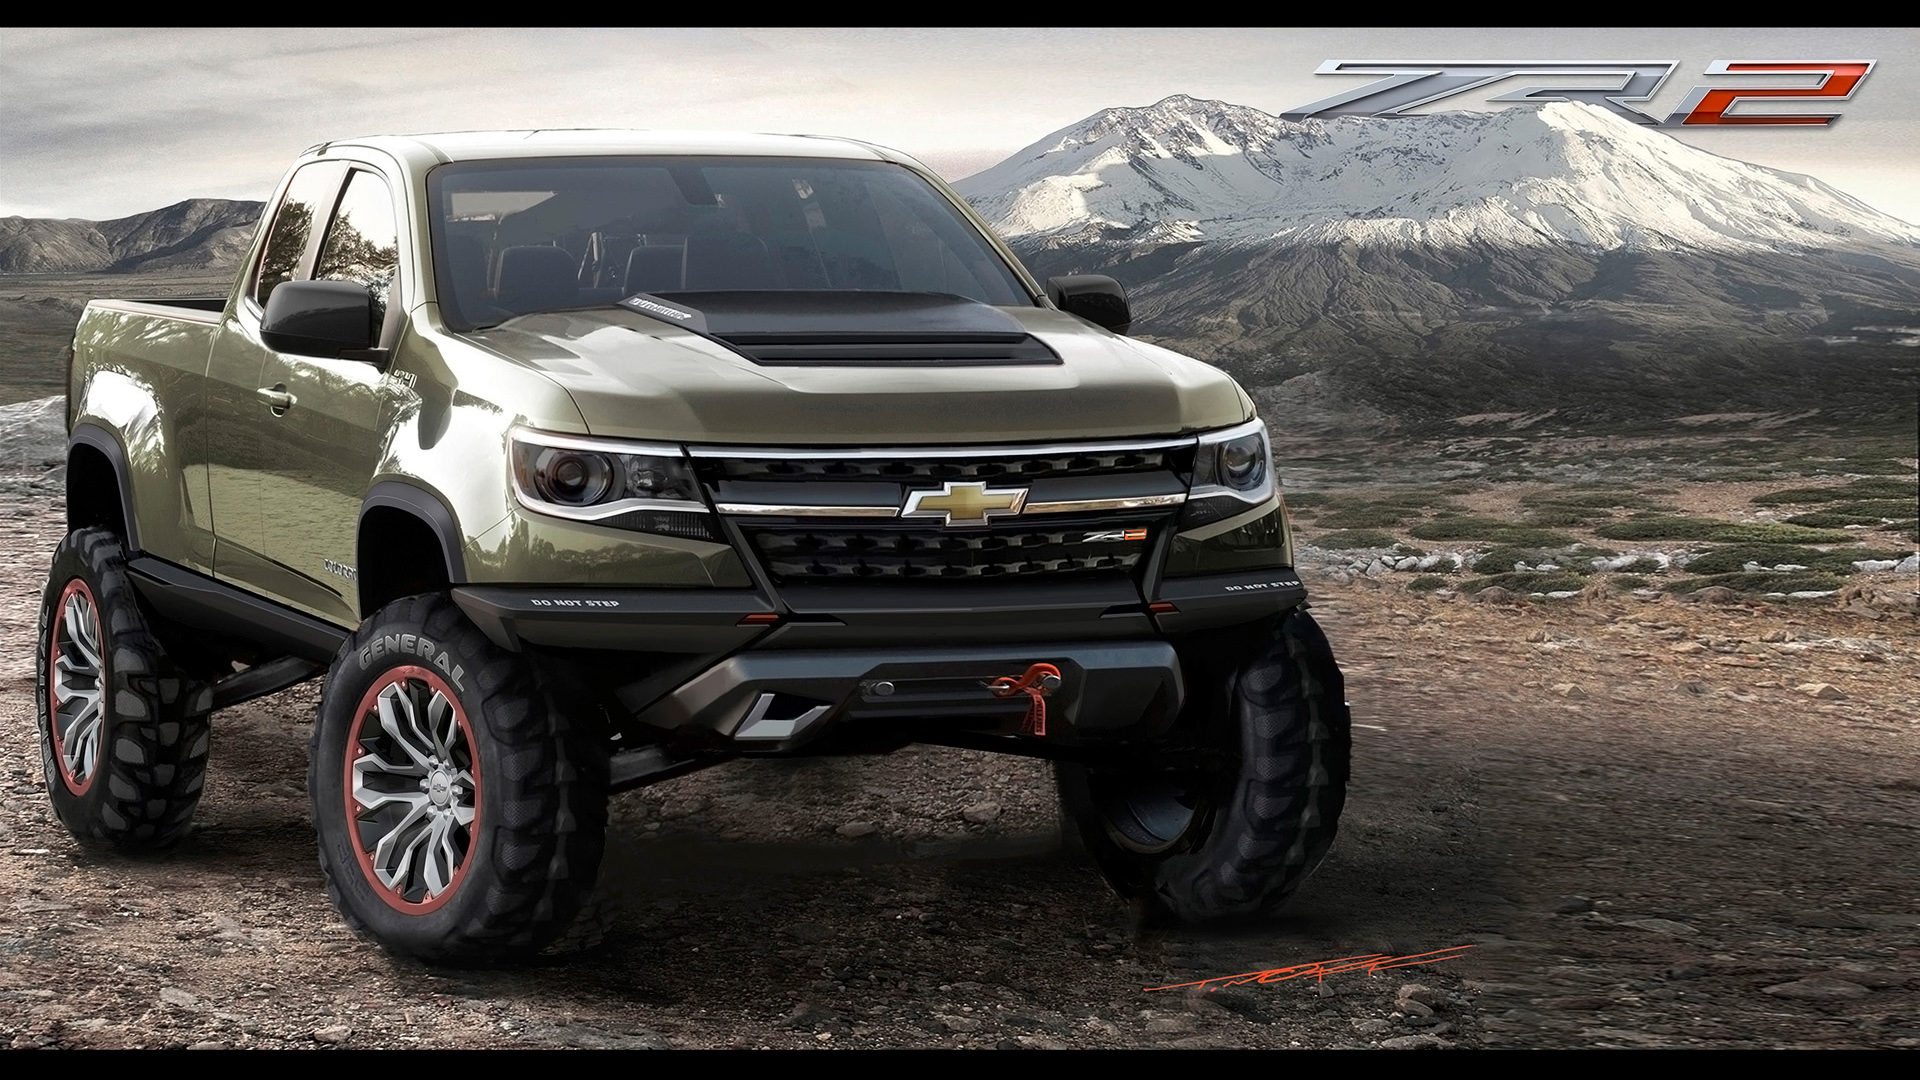 Kelebihan Kekurangan Chevrolet Colorado 2014 Review